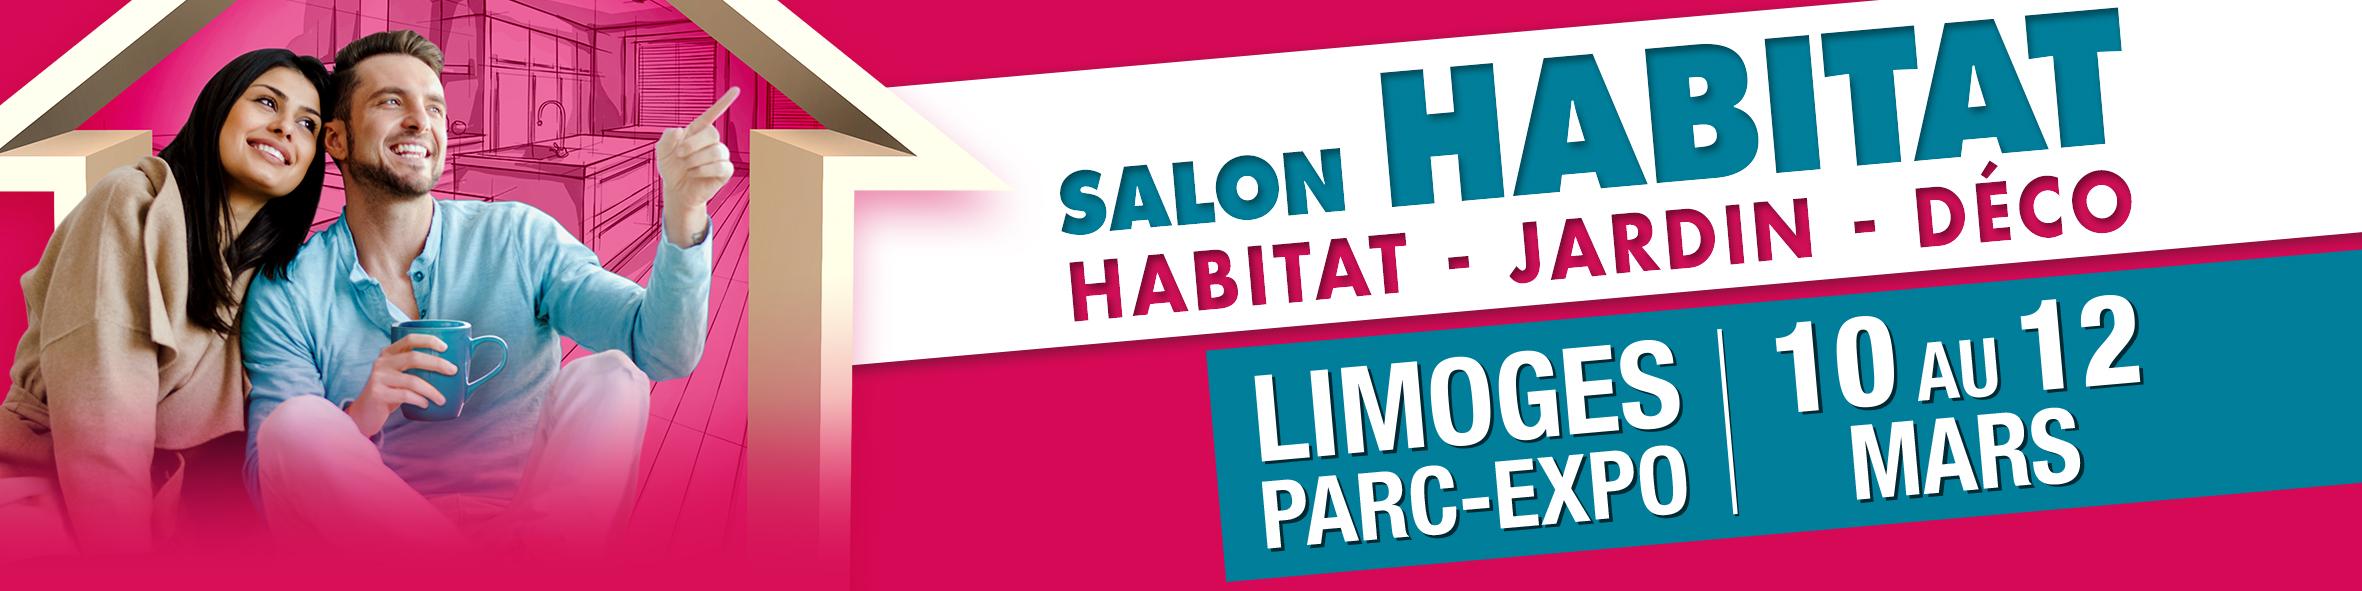 salon habitat limoges